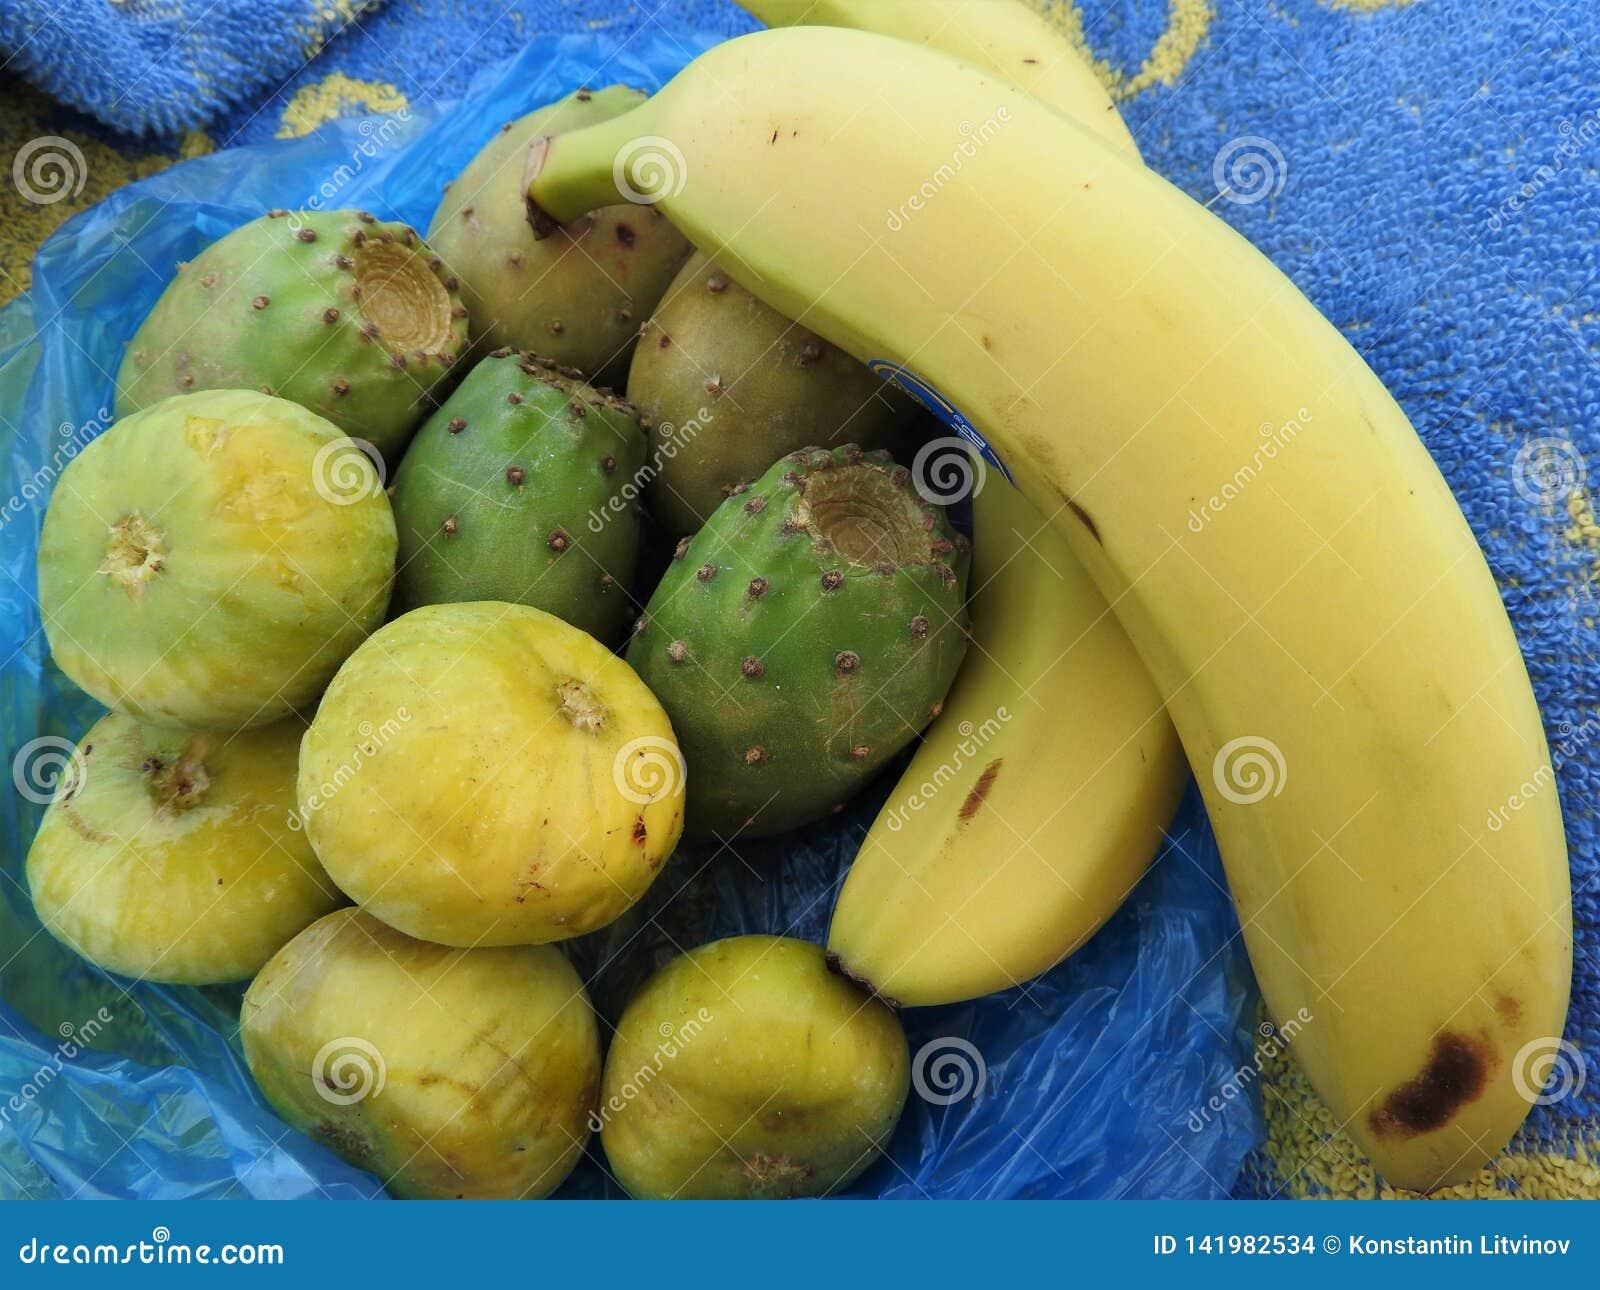 Тропические плоды в пакете на песке в Африке